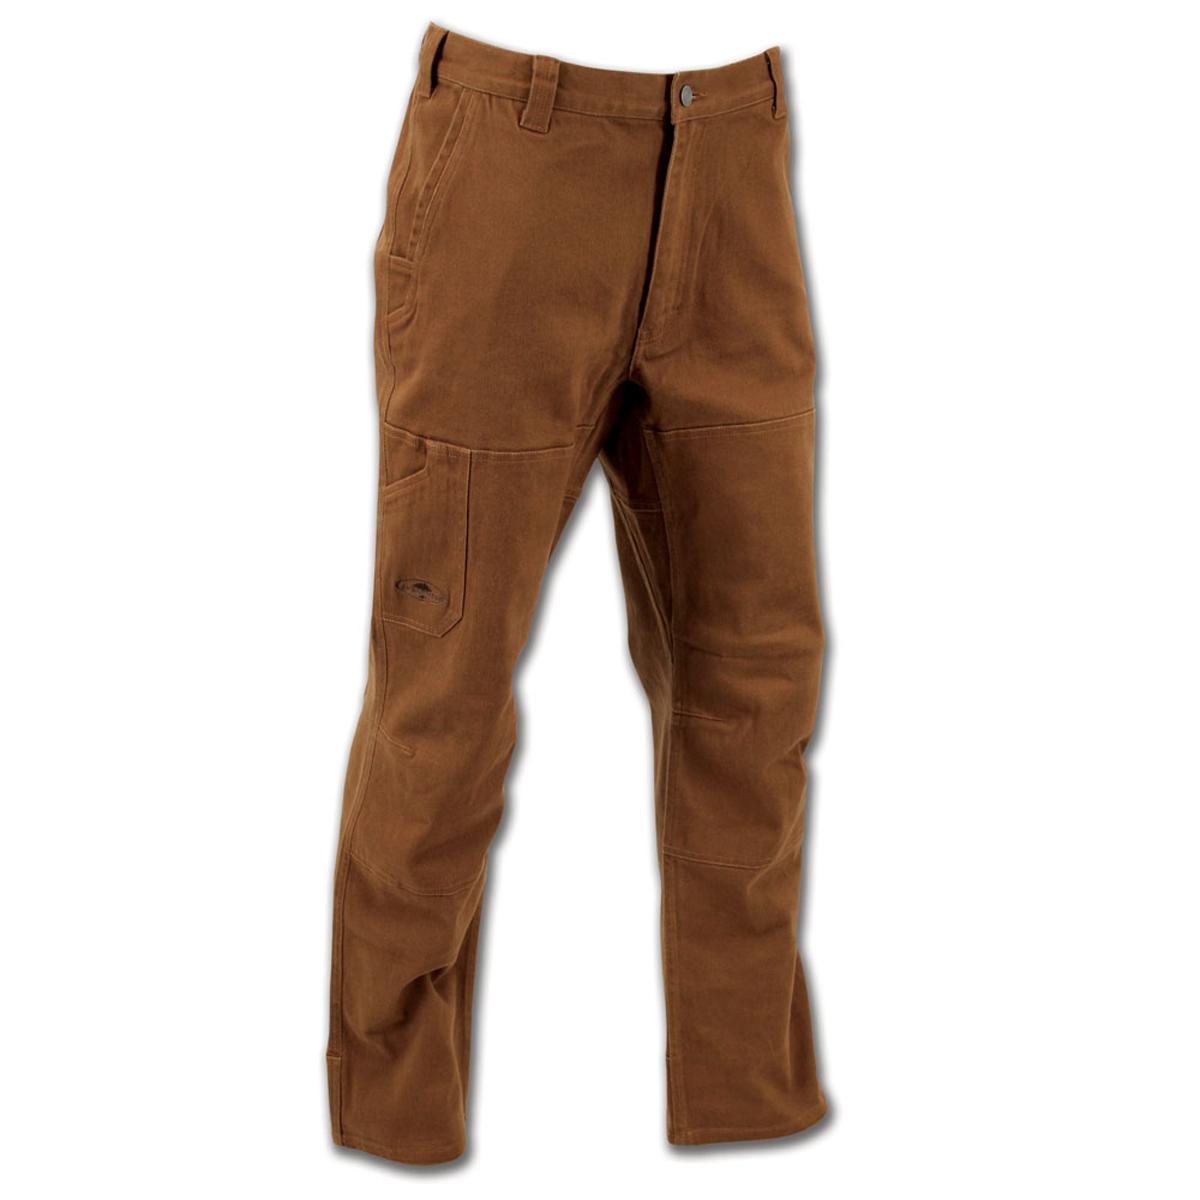 Arborwear Men's Cedar Flex Pant